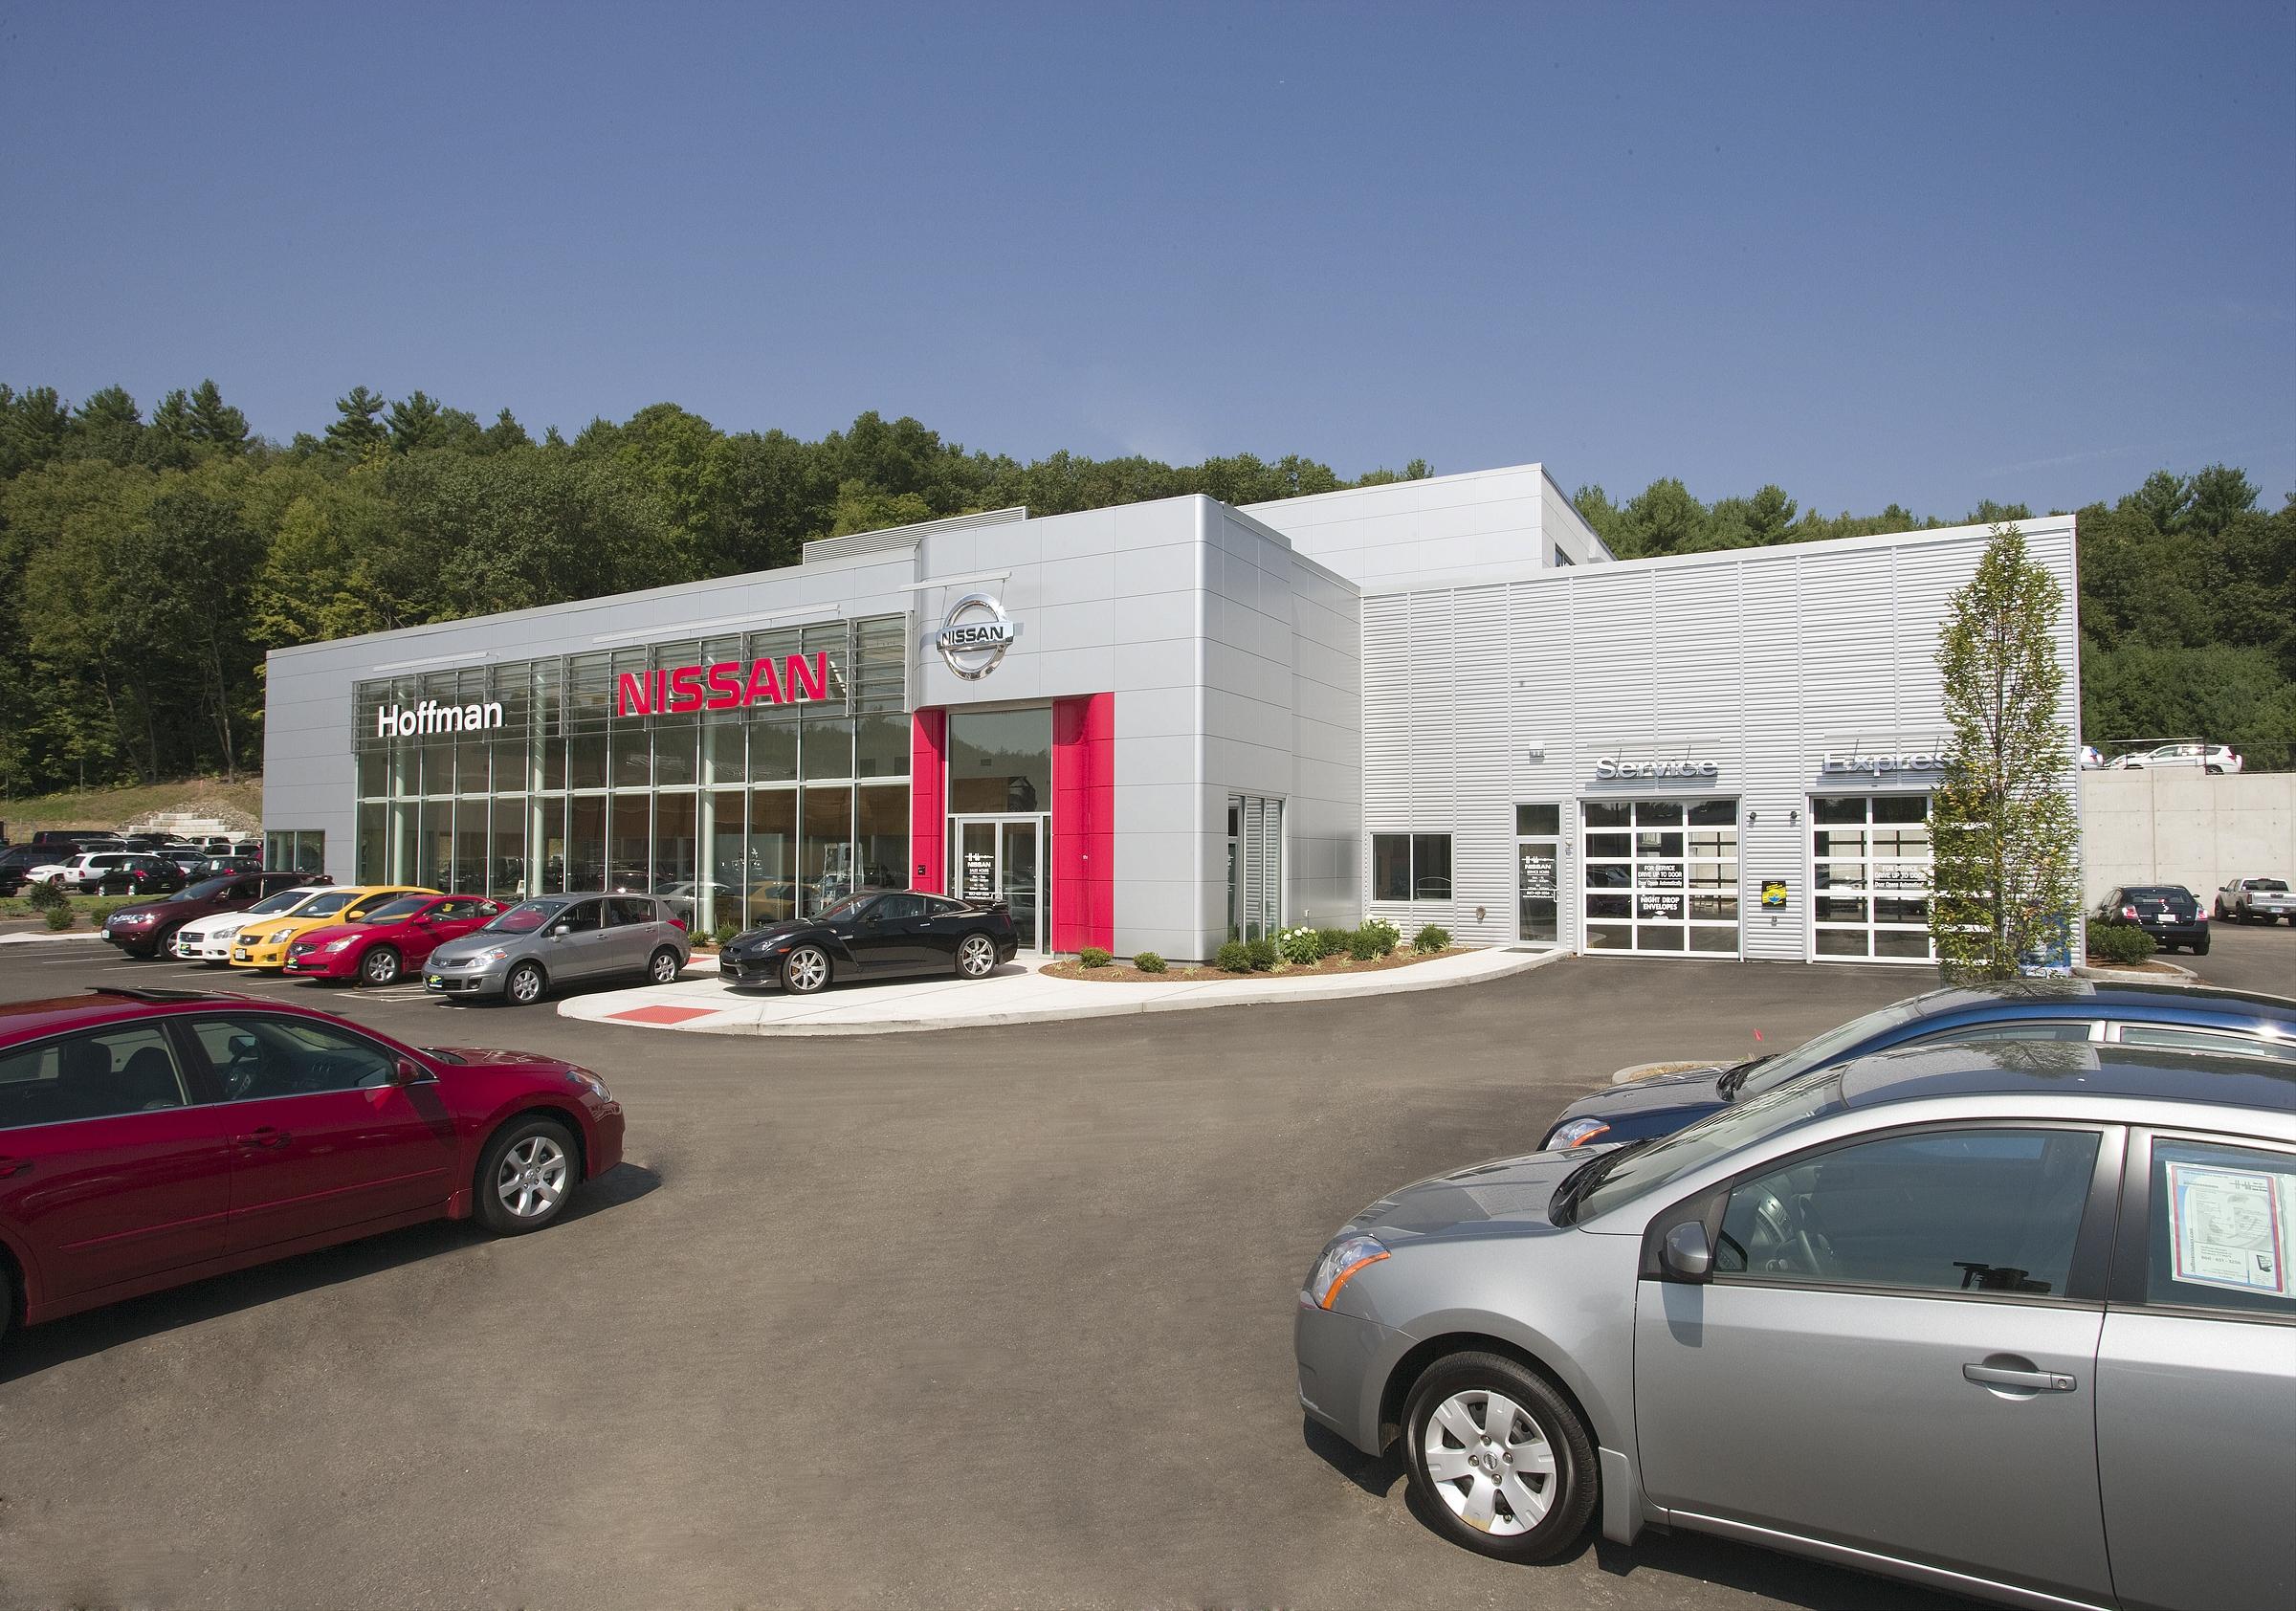 Hoffman Nissan 46 Albany Tpke West Simsbury CT YP